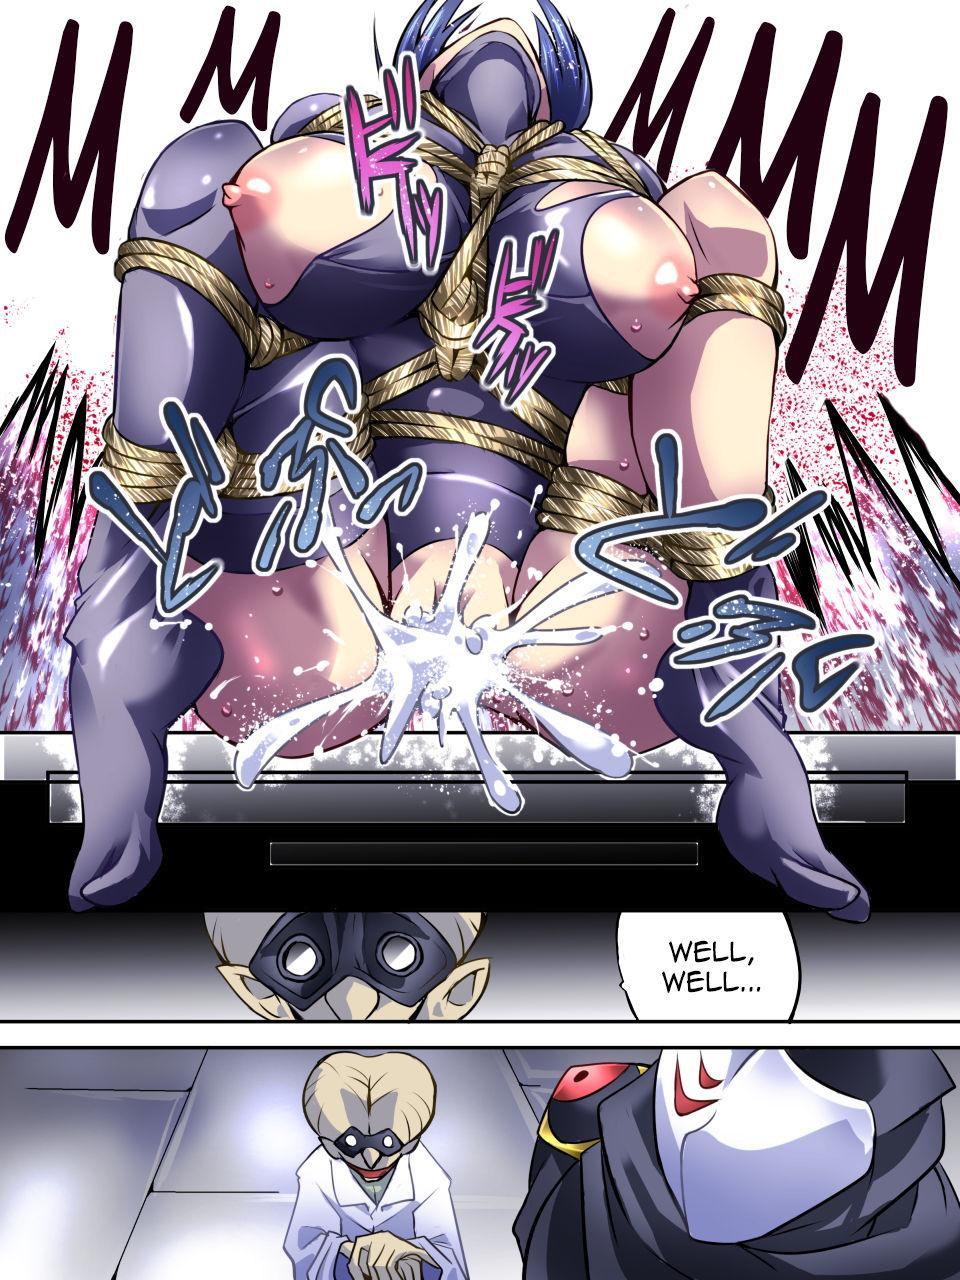 [Atelier Hachifukuan] Superheroine Yuukai Ryoujoku IV - Superheroine in Distress - Kunoichi Suzushiro [English] [Harasho Project] 30